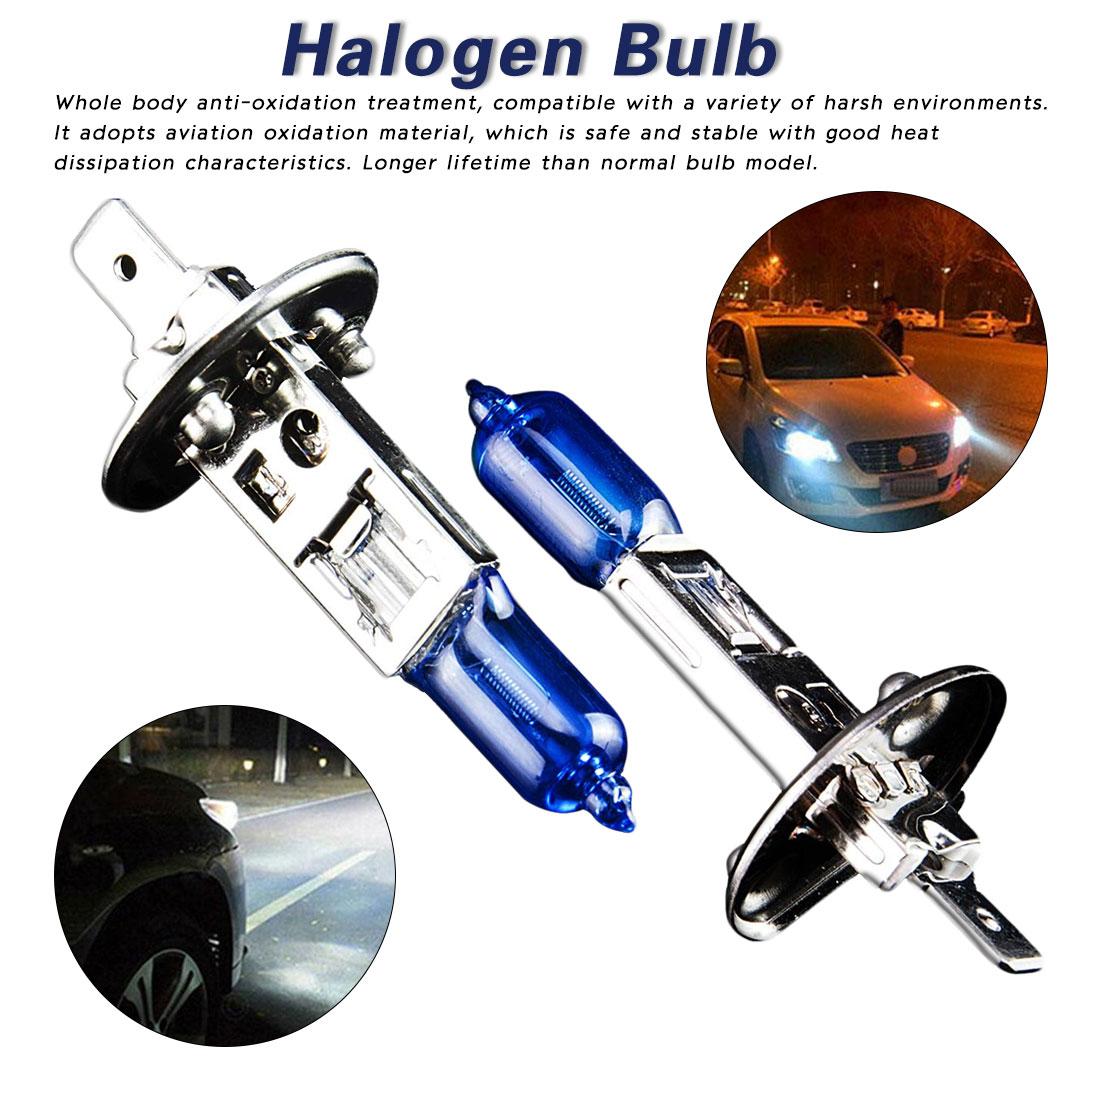 Tonewan lâmpada halógena h1 12 v 100 w 5500-6000k 800lm farol do carro azul escuro de vidro de quartzo lâmpada de luz auto super branco (2 pces)